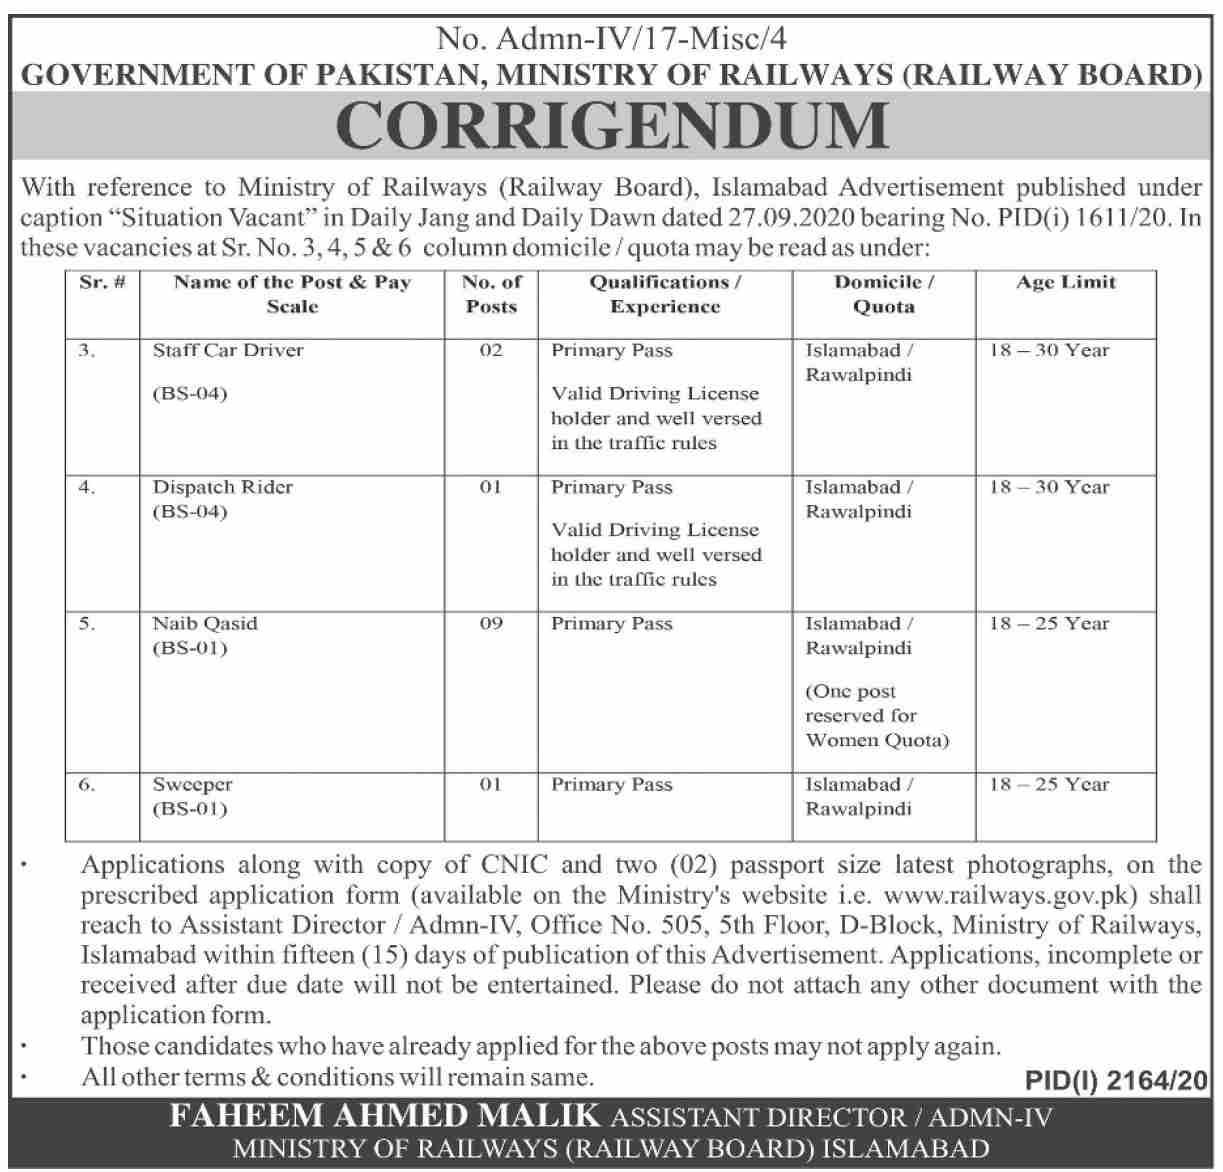 Pakistan Railways Latest Jobs Advertisement For Male and Female in Pakistan